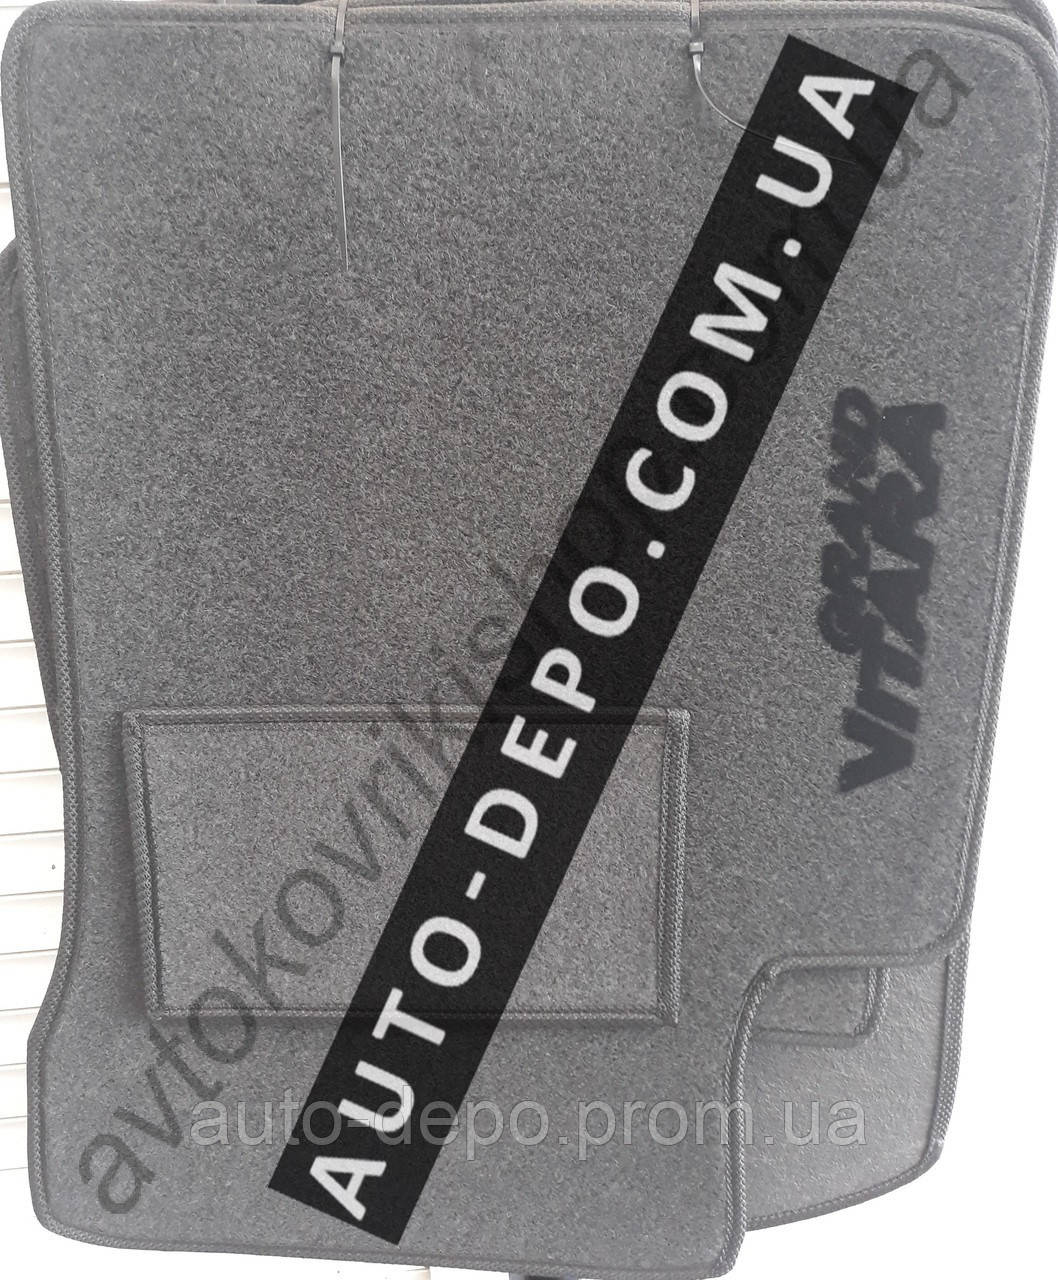 Ворсовые коврики Suzuki Grand Vitara 1997- VIP ЛЮКС АВТО-ВОРС